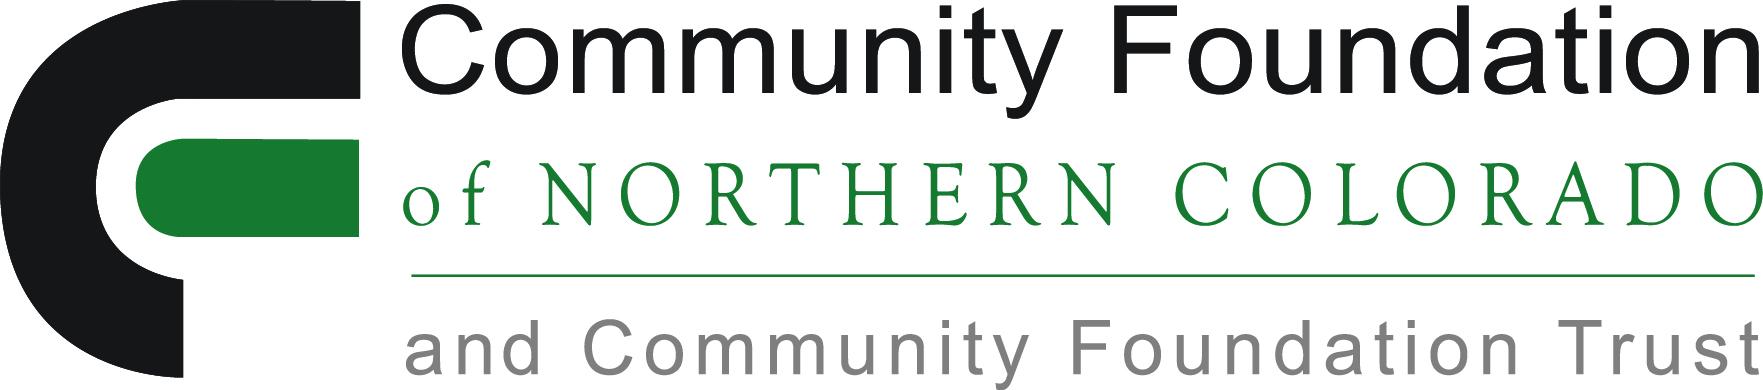 Community Foundation of Northern Colorado shops